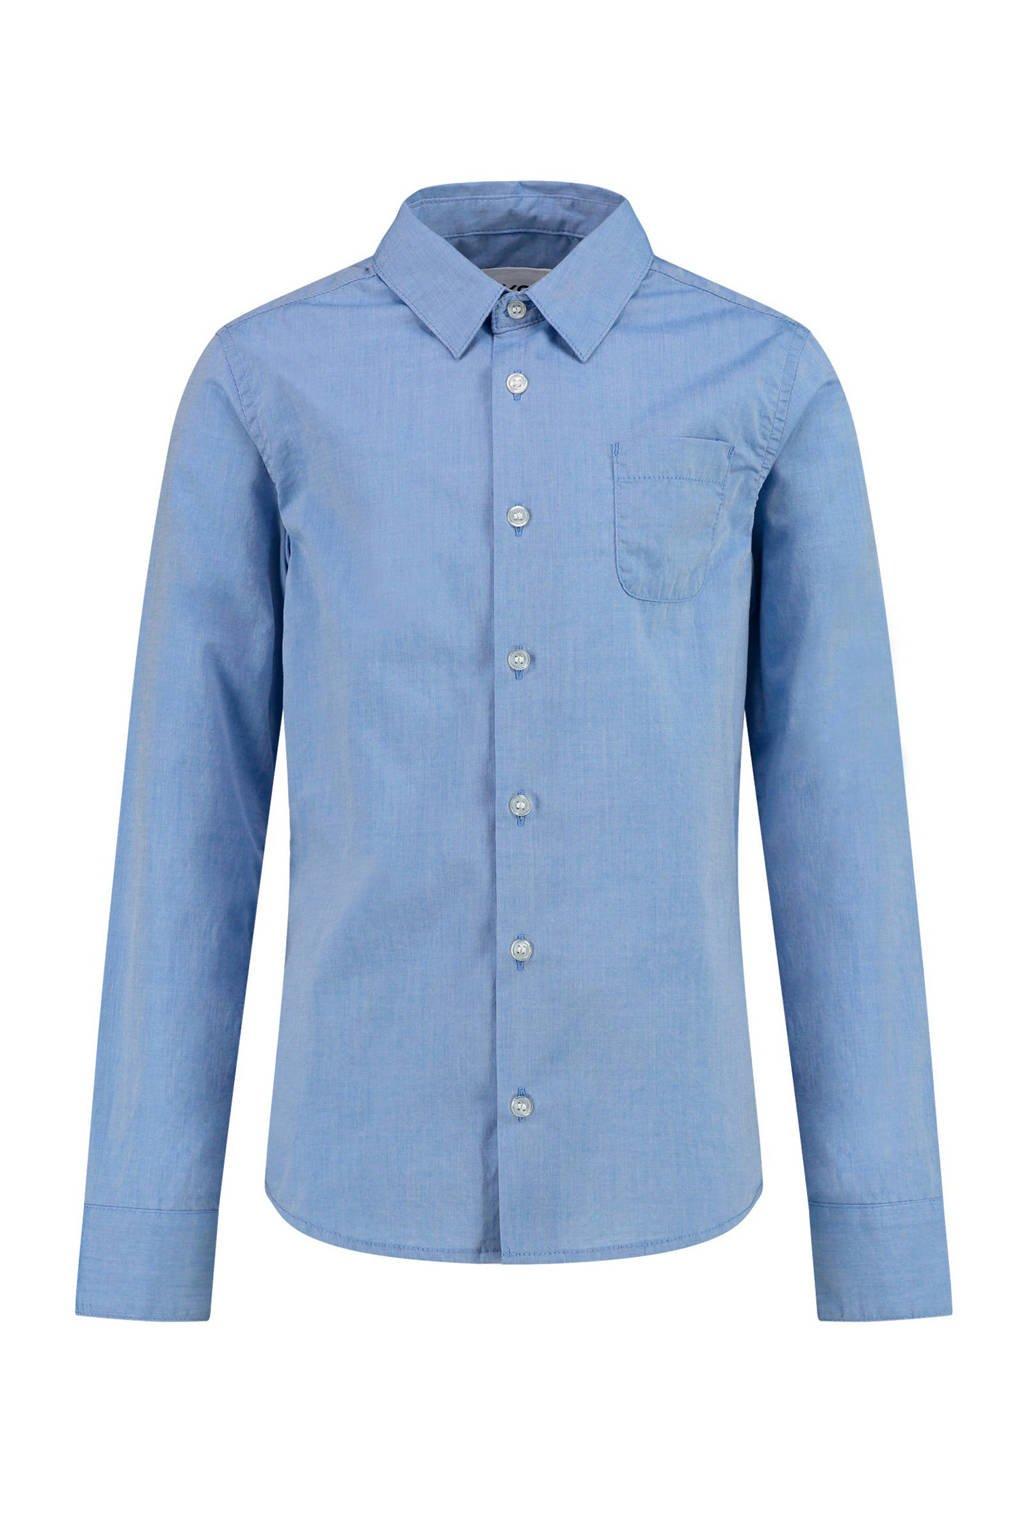 CKS KIDS overhemd Bougar blauw, Blauw